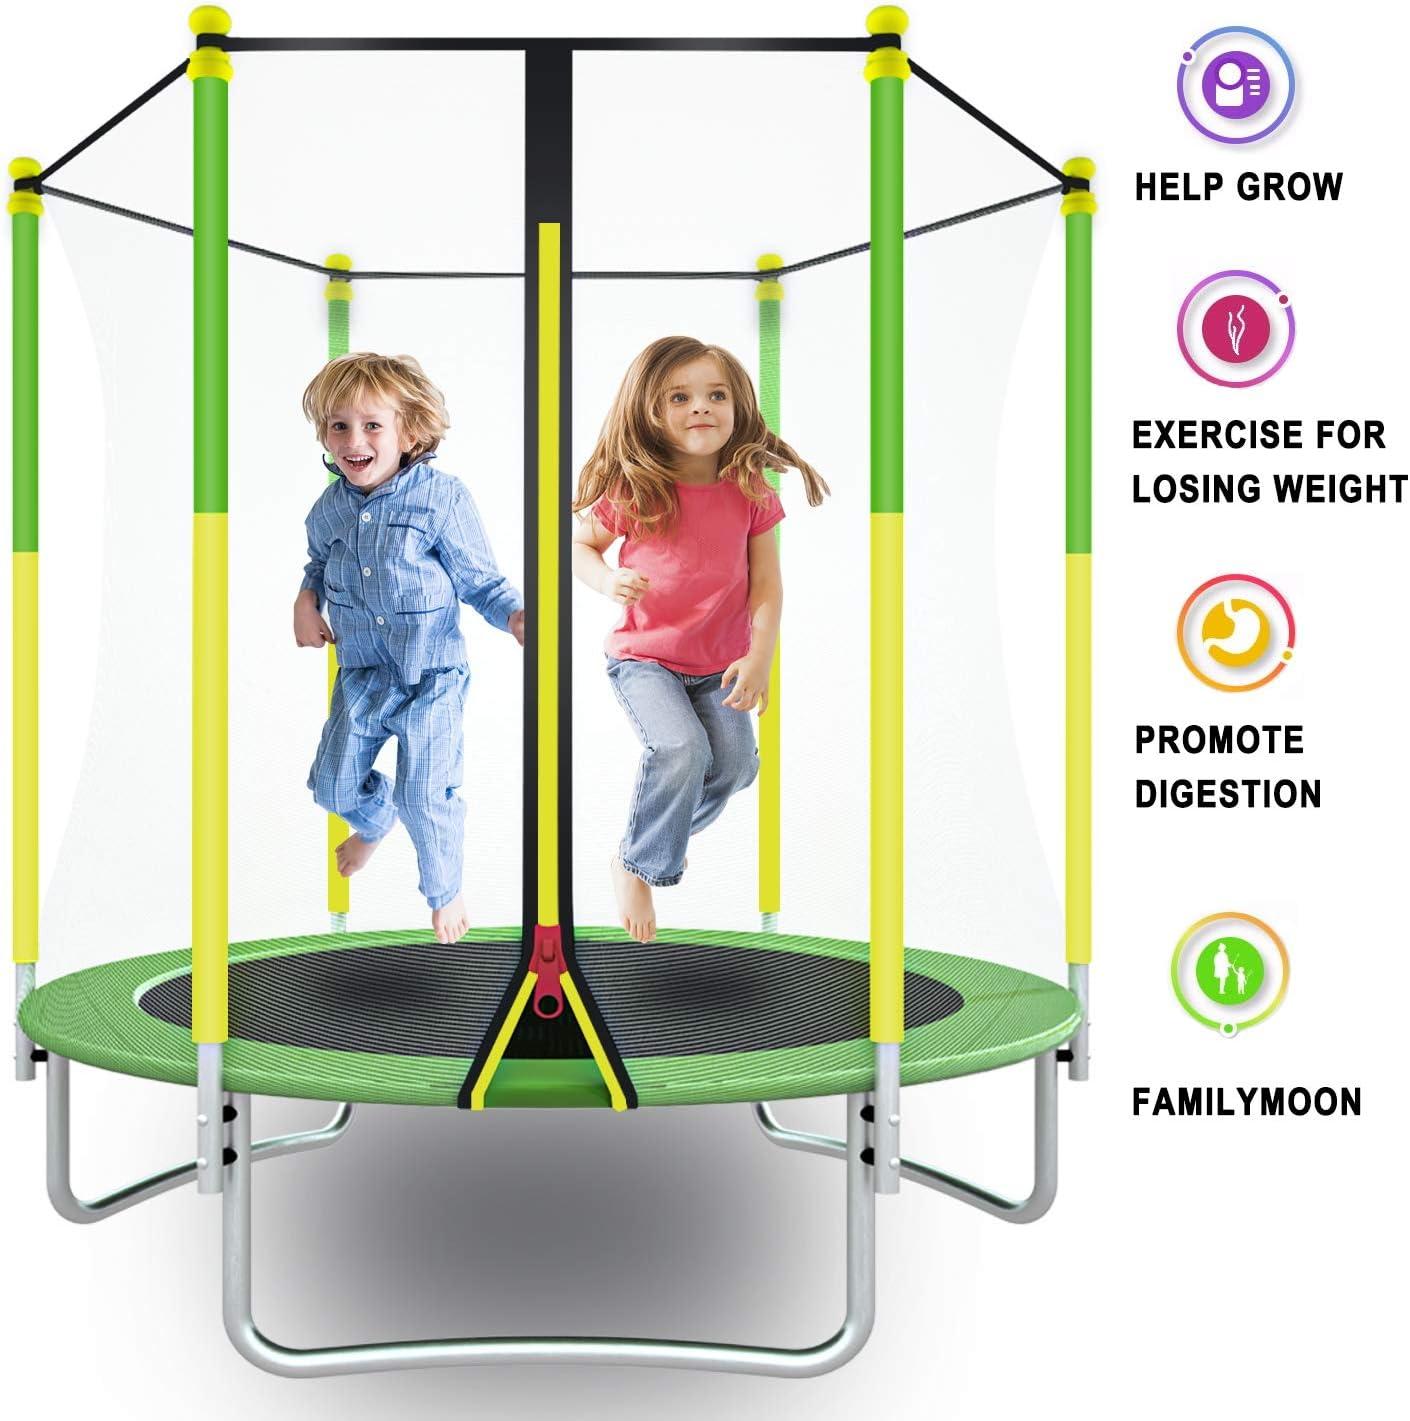 Bounce Jumper for Toddler Ridkodg 【US Fast Shipment】 5FT Kids Trampoline with Enclosure Net /& Spring Cover Padding Safety Outdoor Recreational Rebounder Trampoline for Boys /&Girls